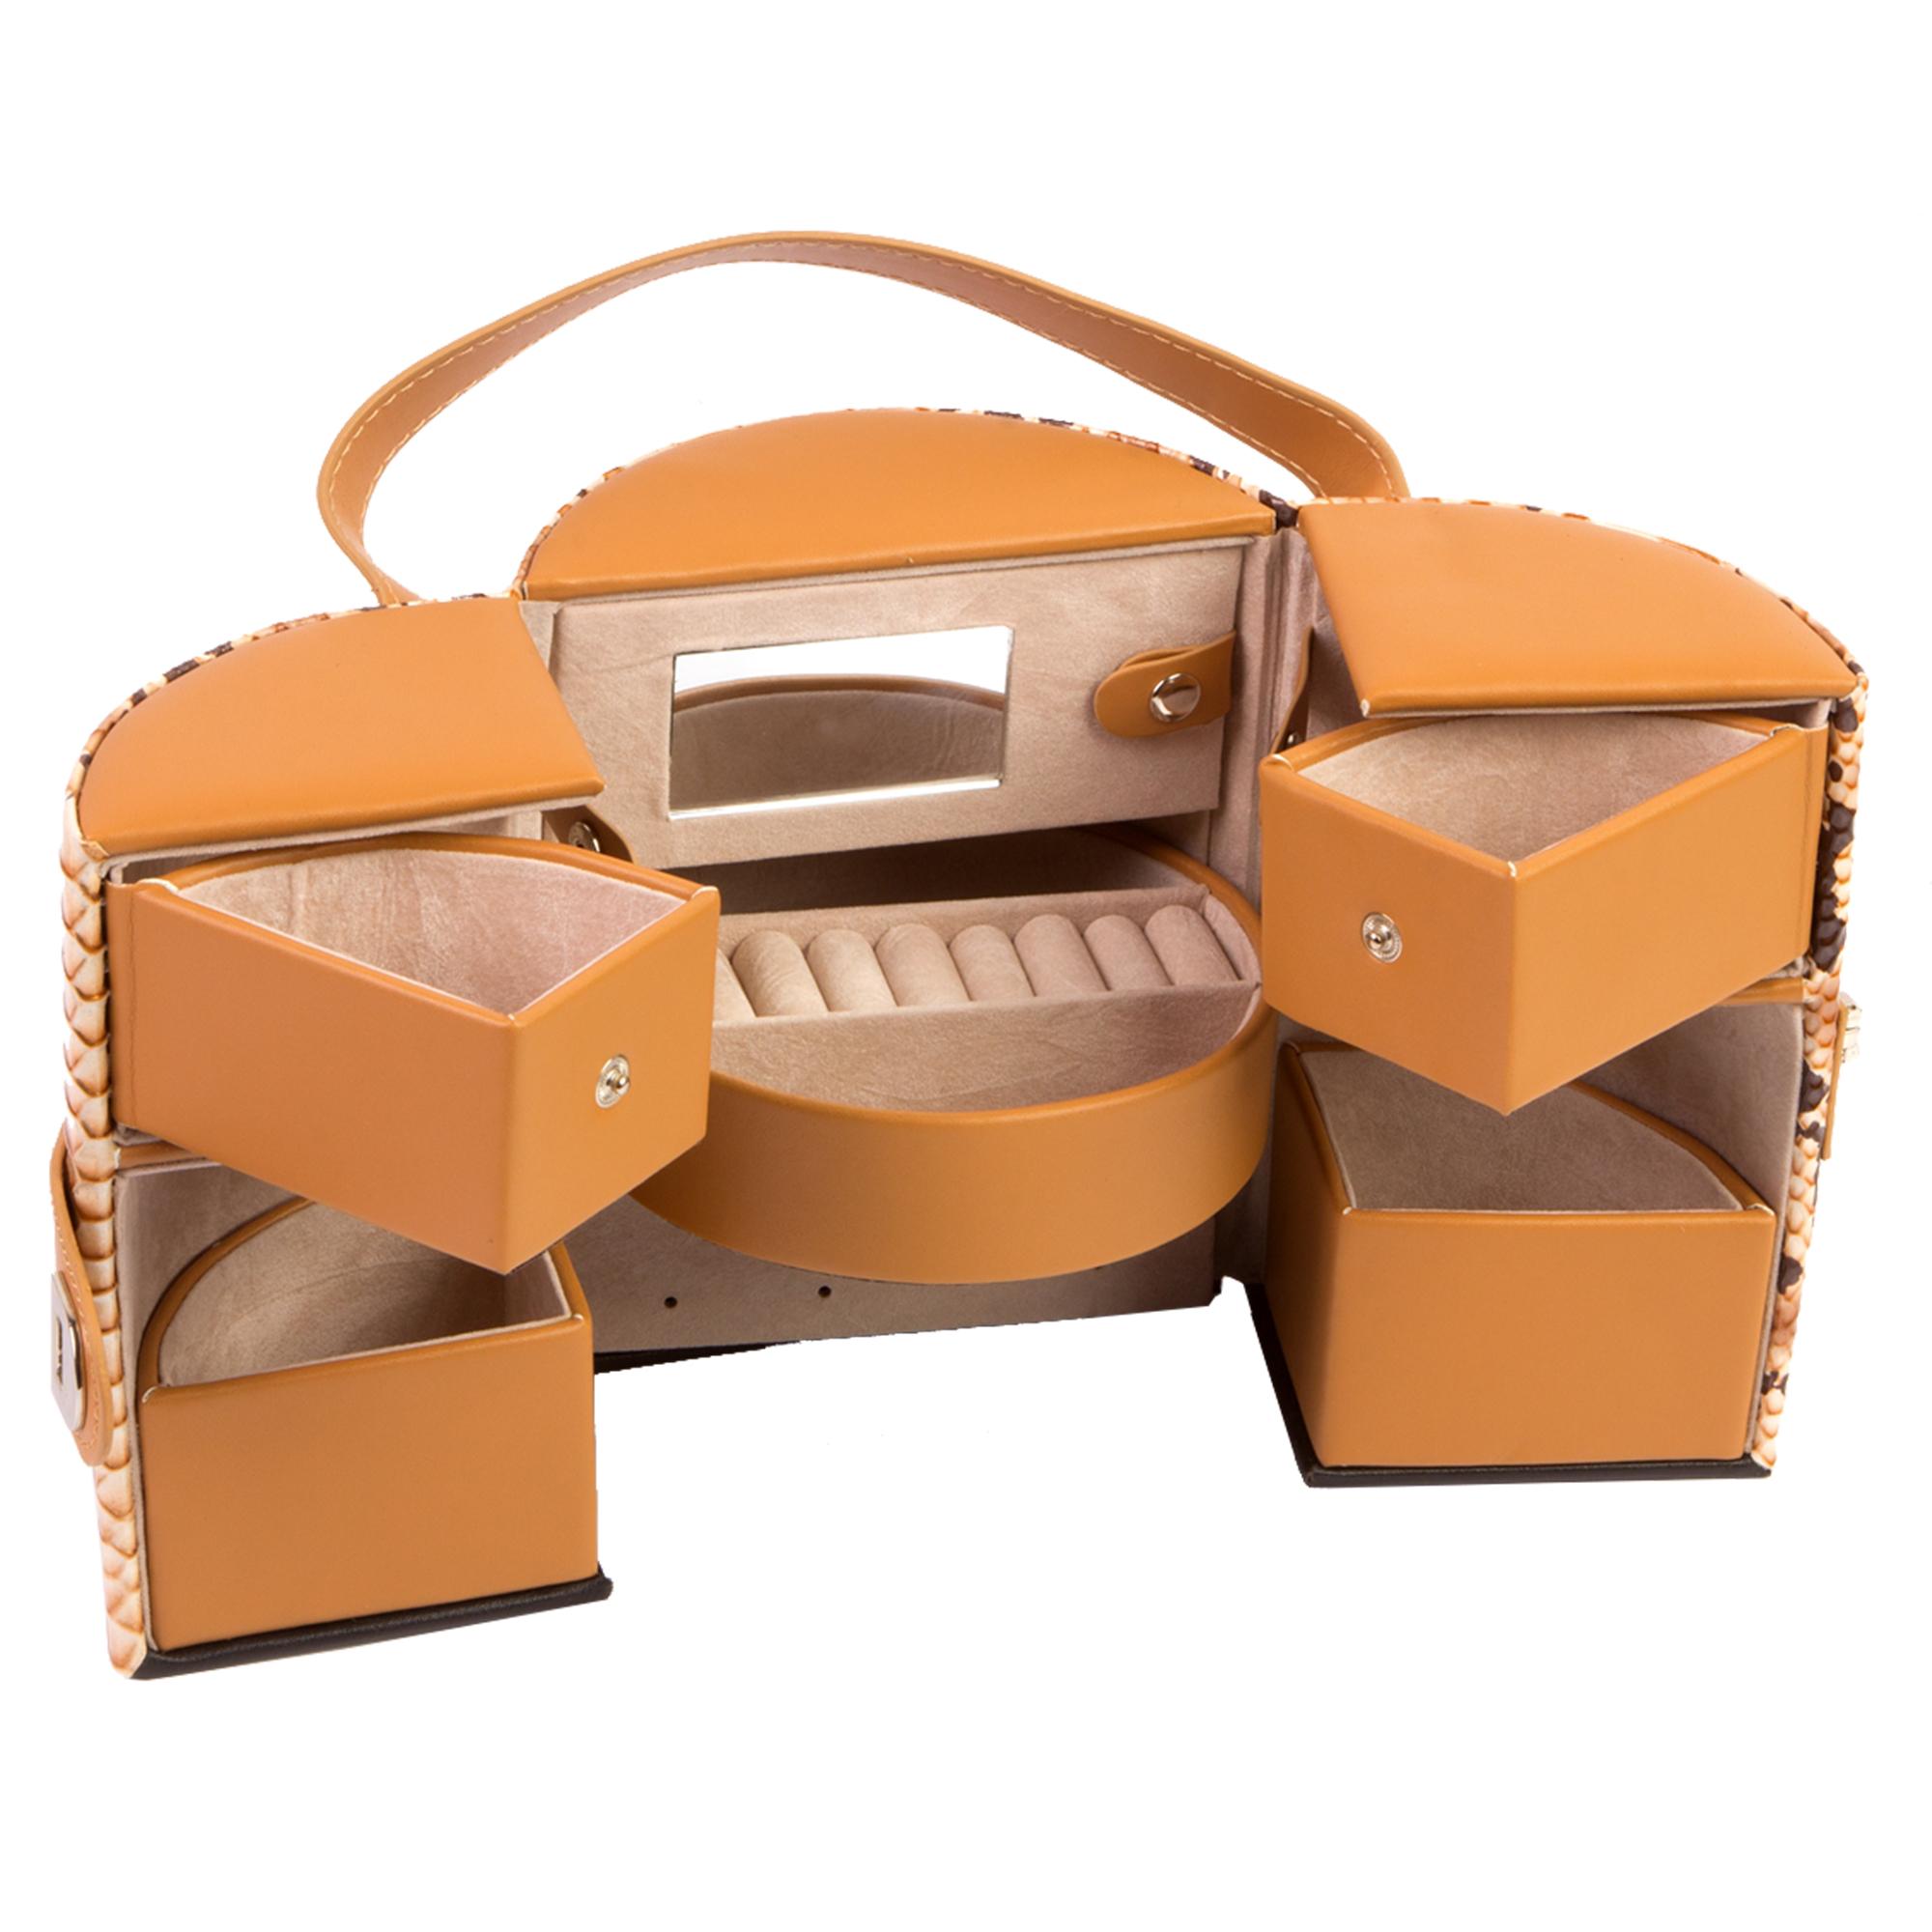 Шкатулка для хранения бижутерии «Акура»